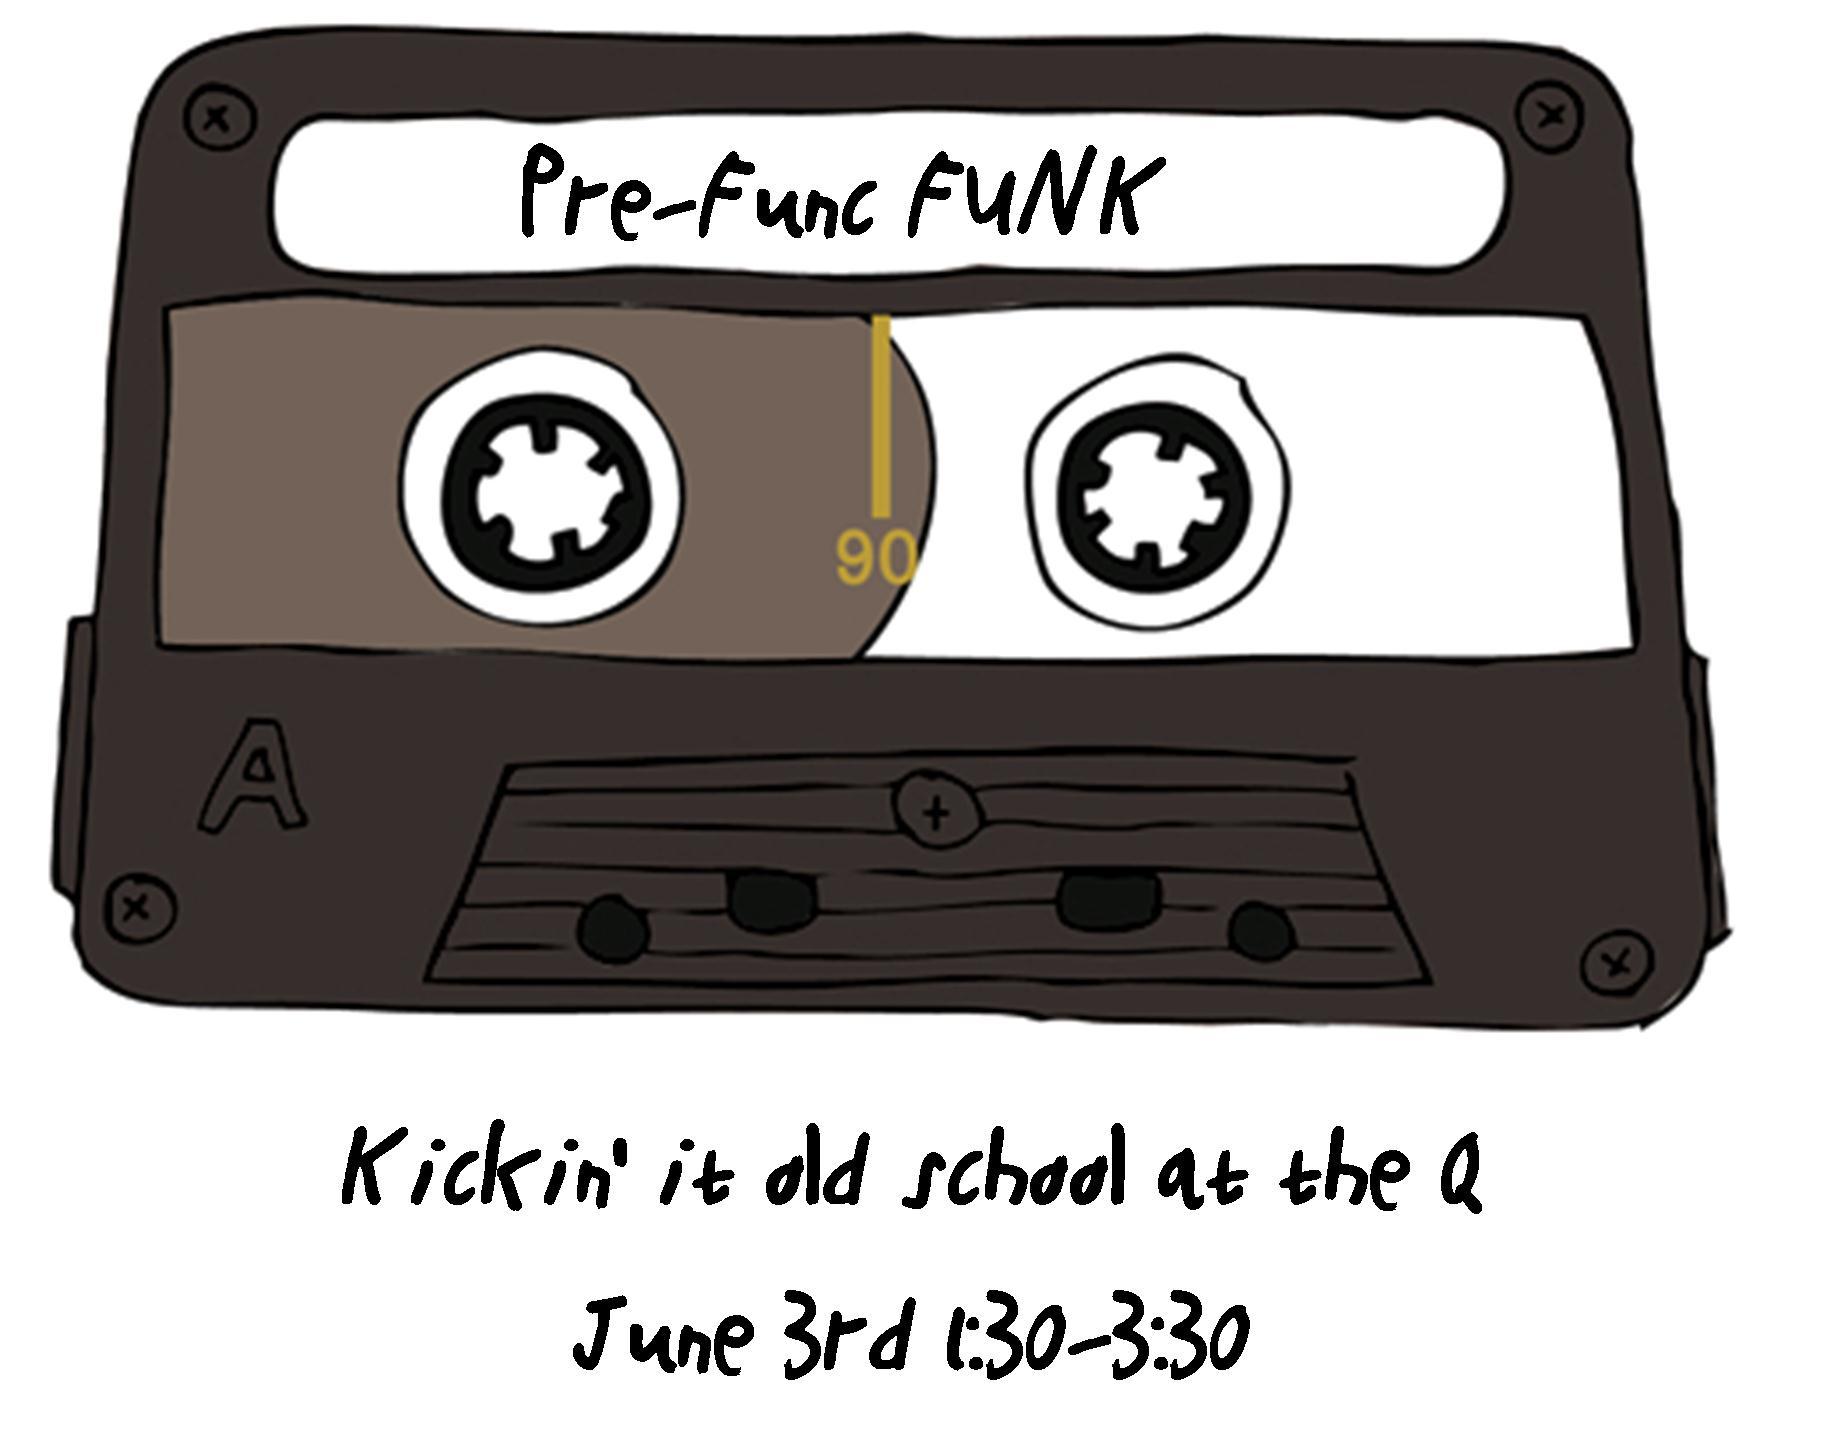 pre-func funk